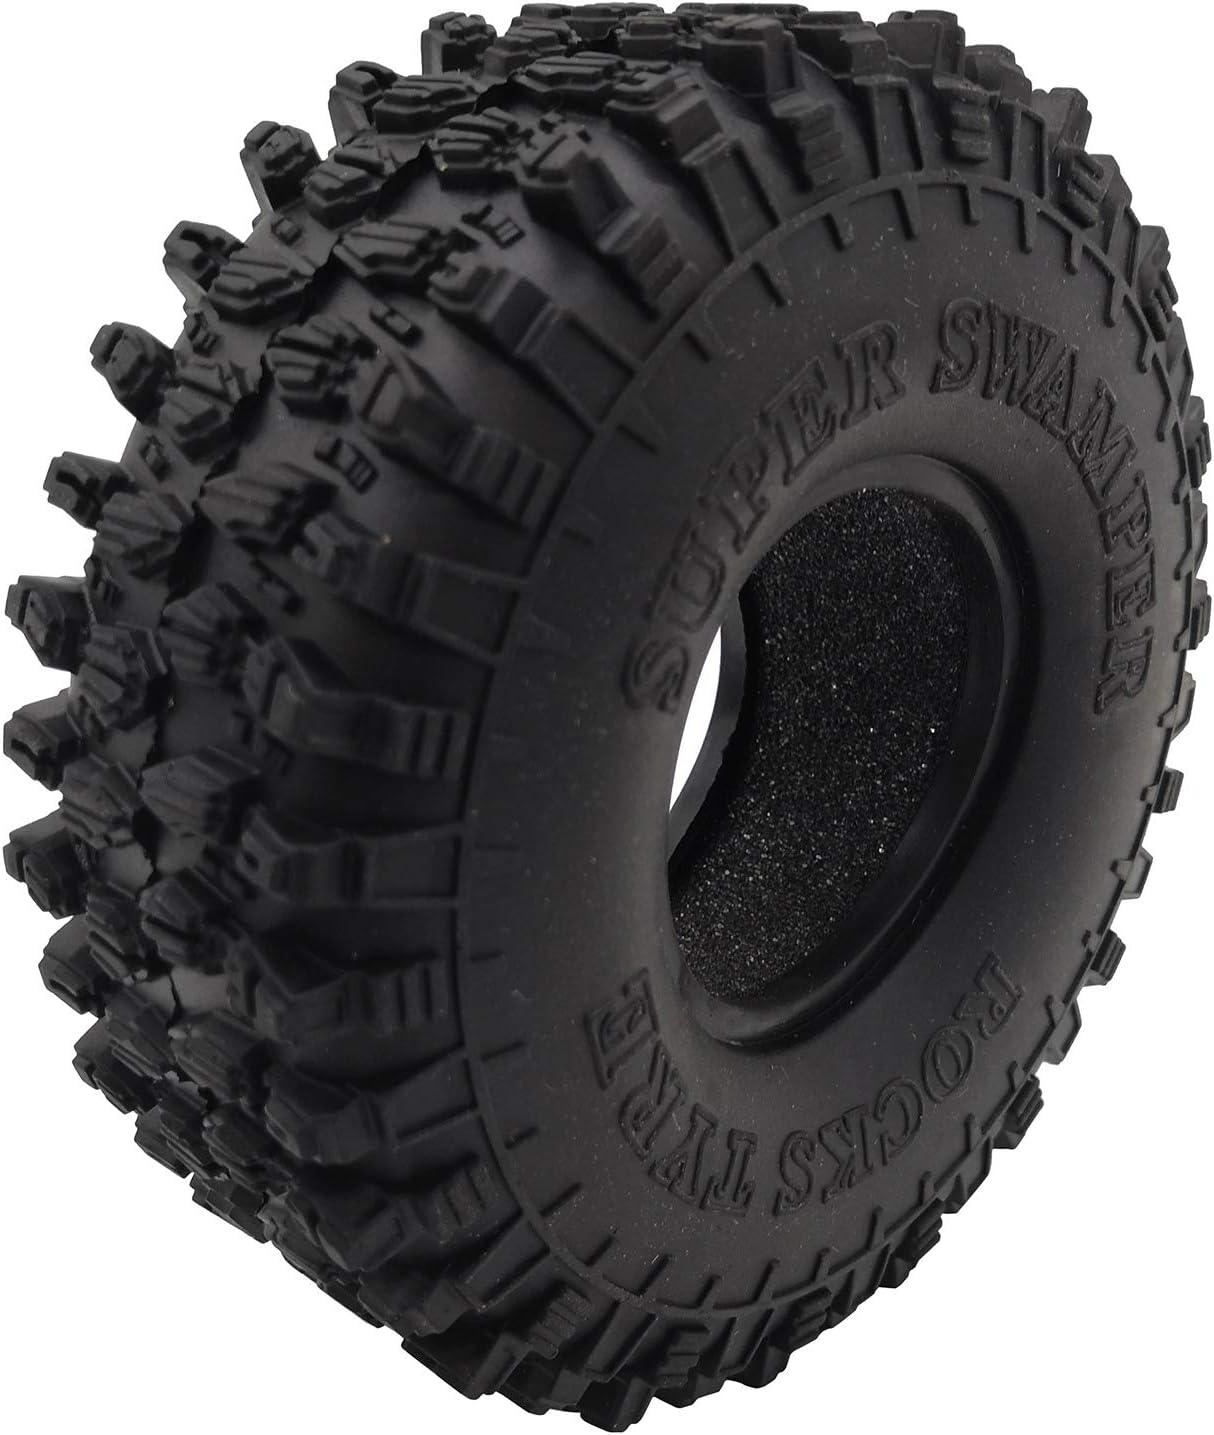 LQNB 4 St/üCke 120MM 1.9 Rubber Rocks Reifen Rad Reifen f/ür 1//10 RC Crawler Axial SCX10 90046 AXI03007 TRX4 D90 TF2